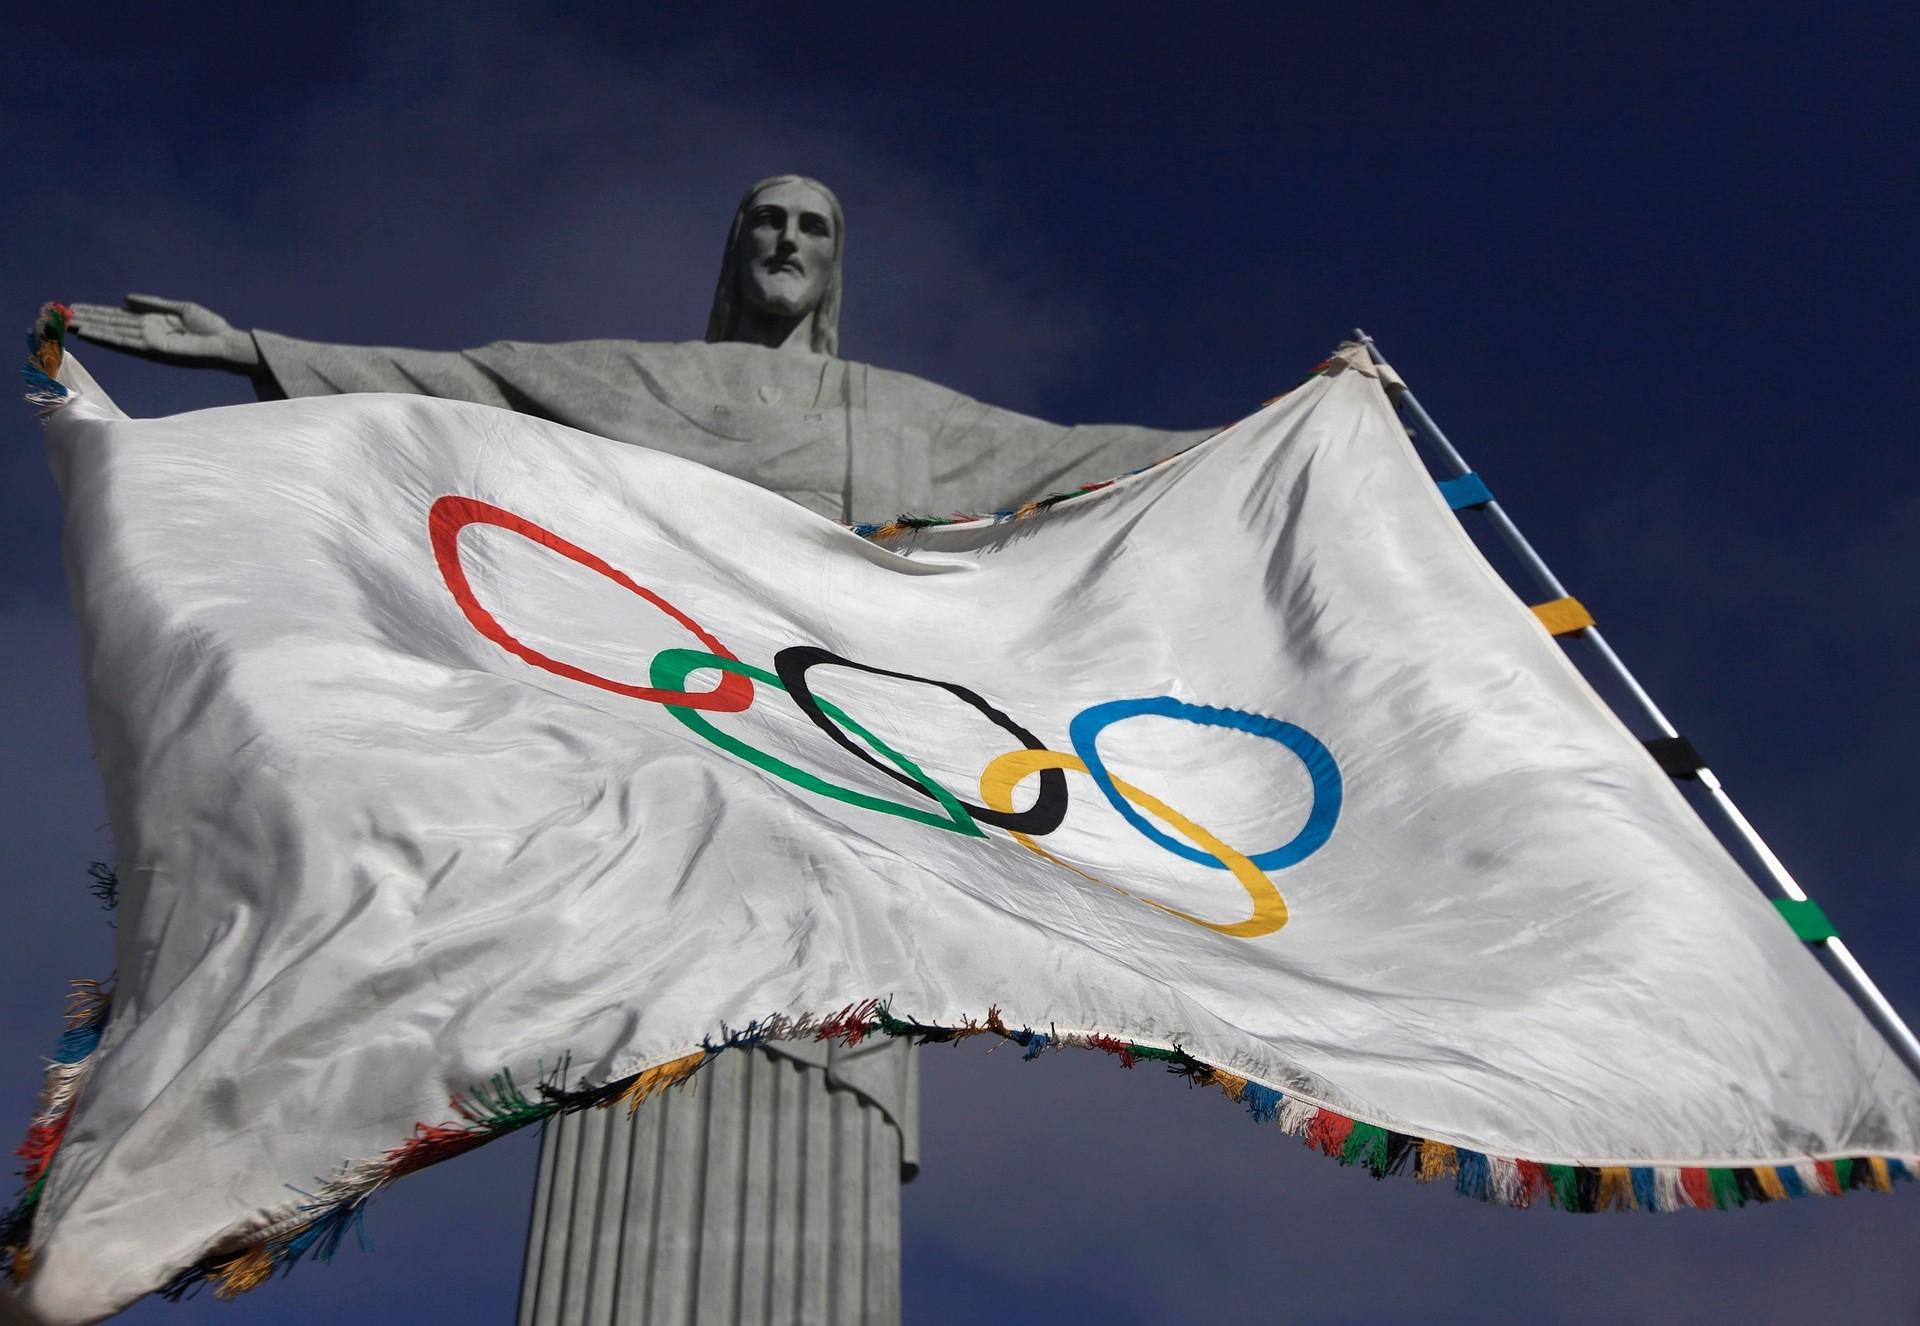 <p>Статуя Христа-Искупителя и флаг олимпиады. Фото: &copy;&nbsp;<span>REUTERS/Ricardo Moraes</span></p>